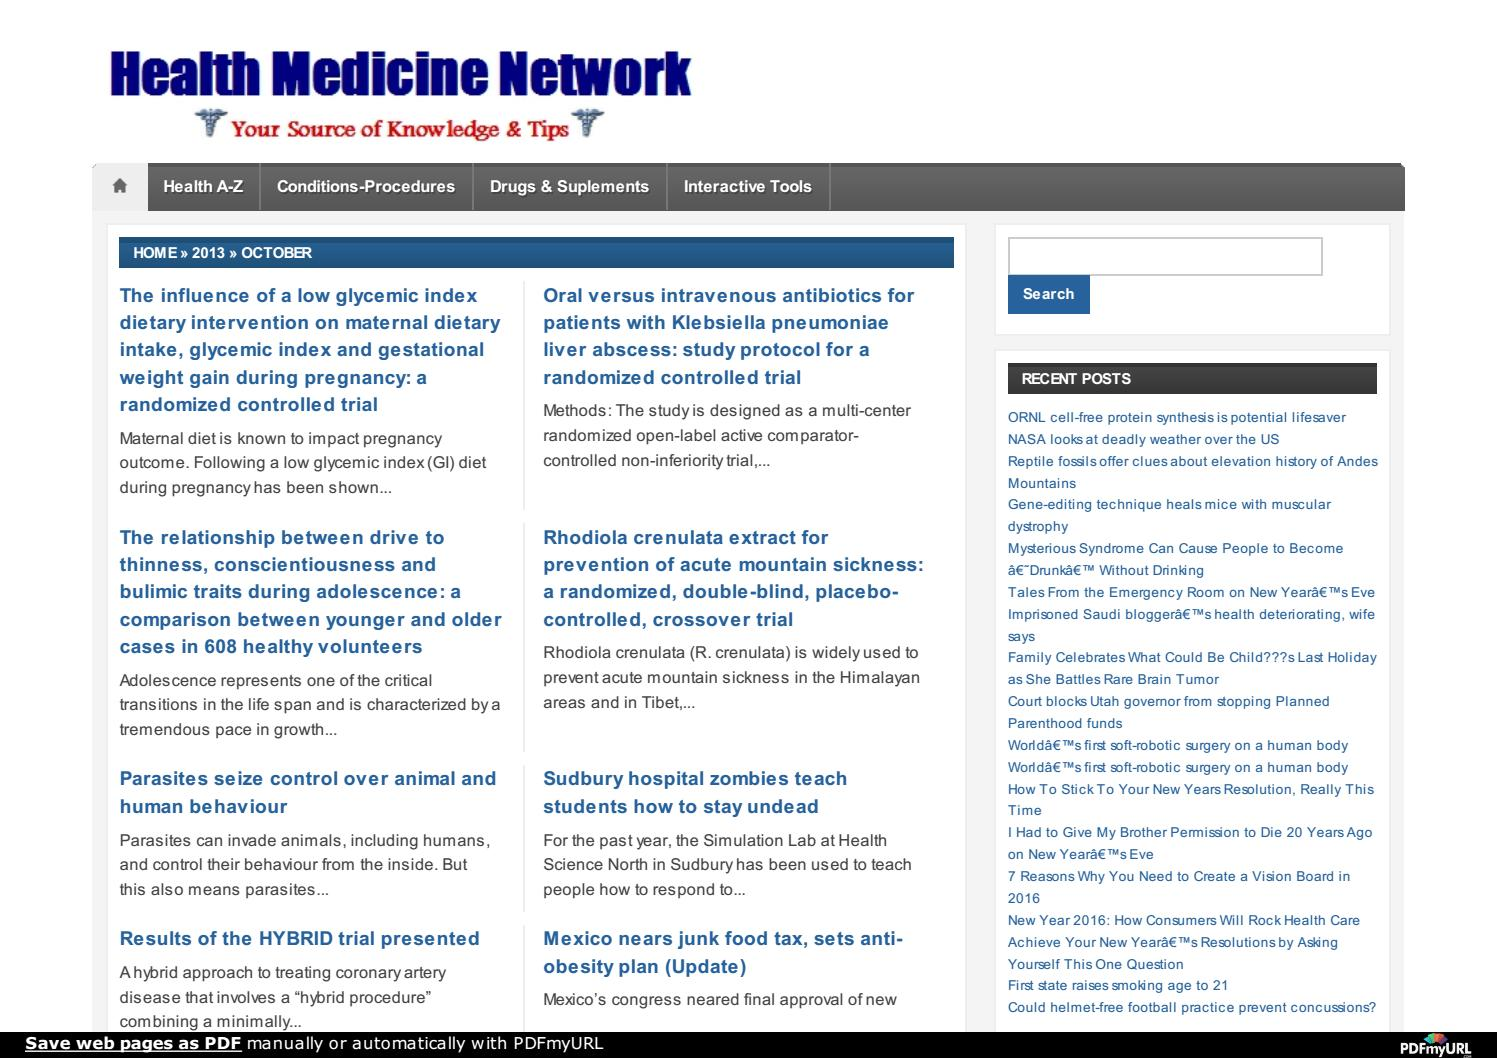 100% authentic 2d7ed 158c5 Http healthmedicinet com ii 2013 10 by tuni sante - issuu